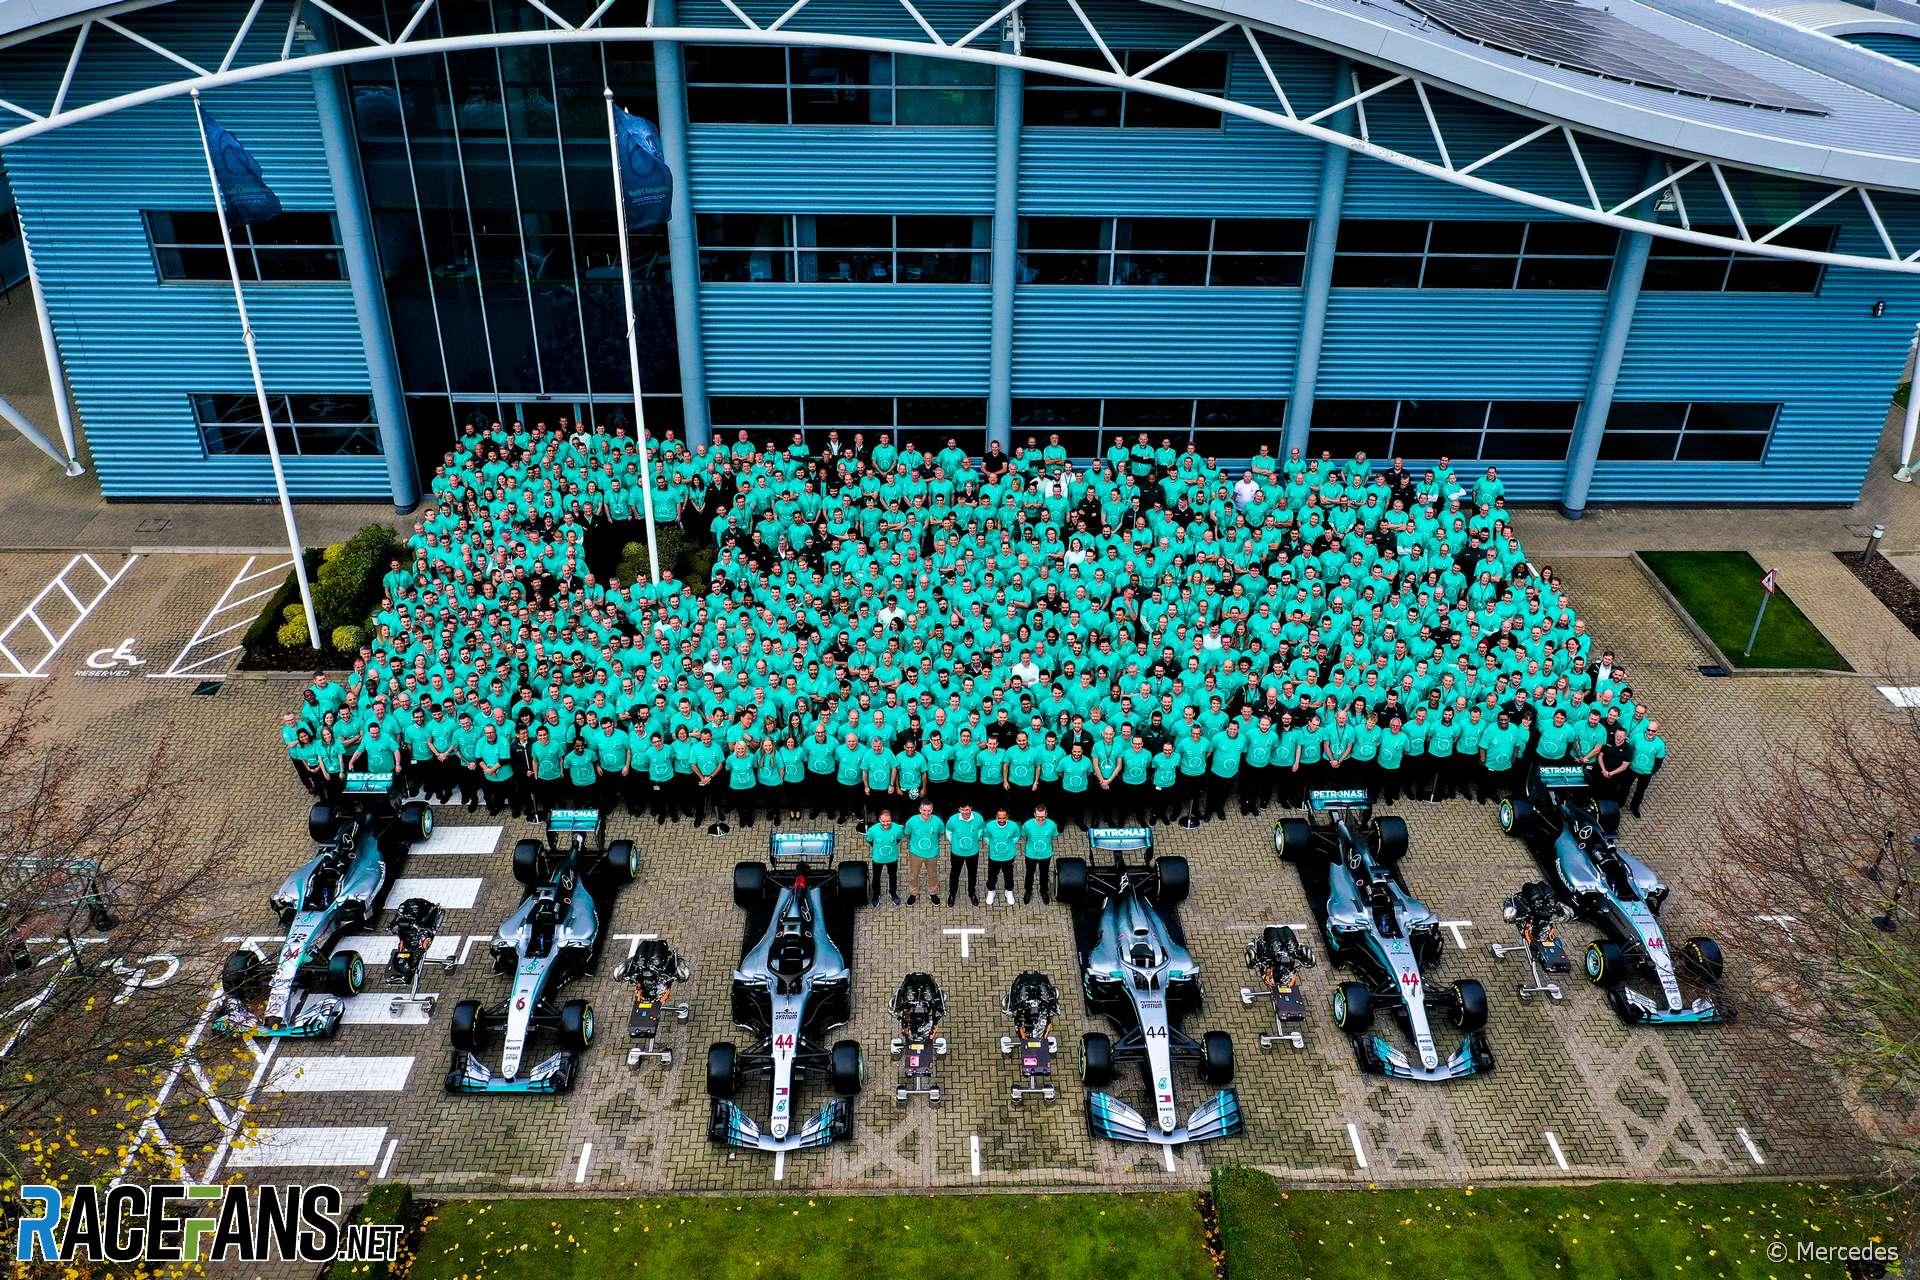 Mercedes' sixth world championship celebrations, 2019